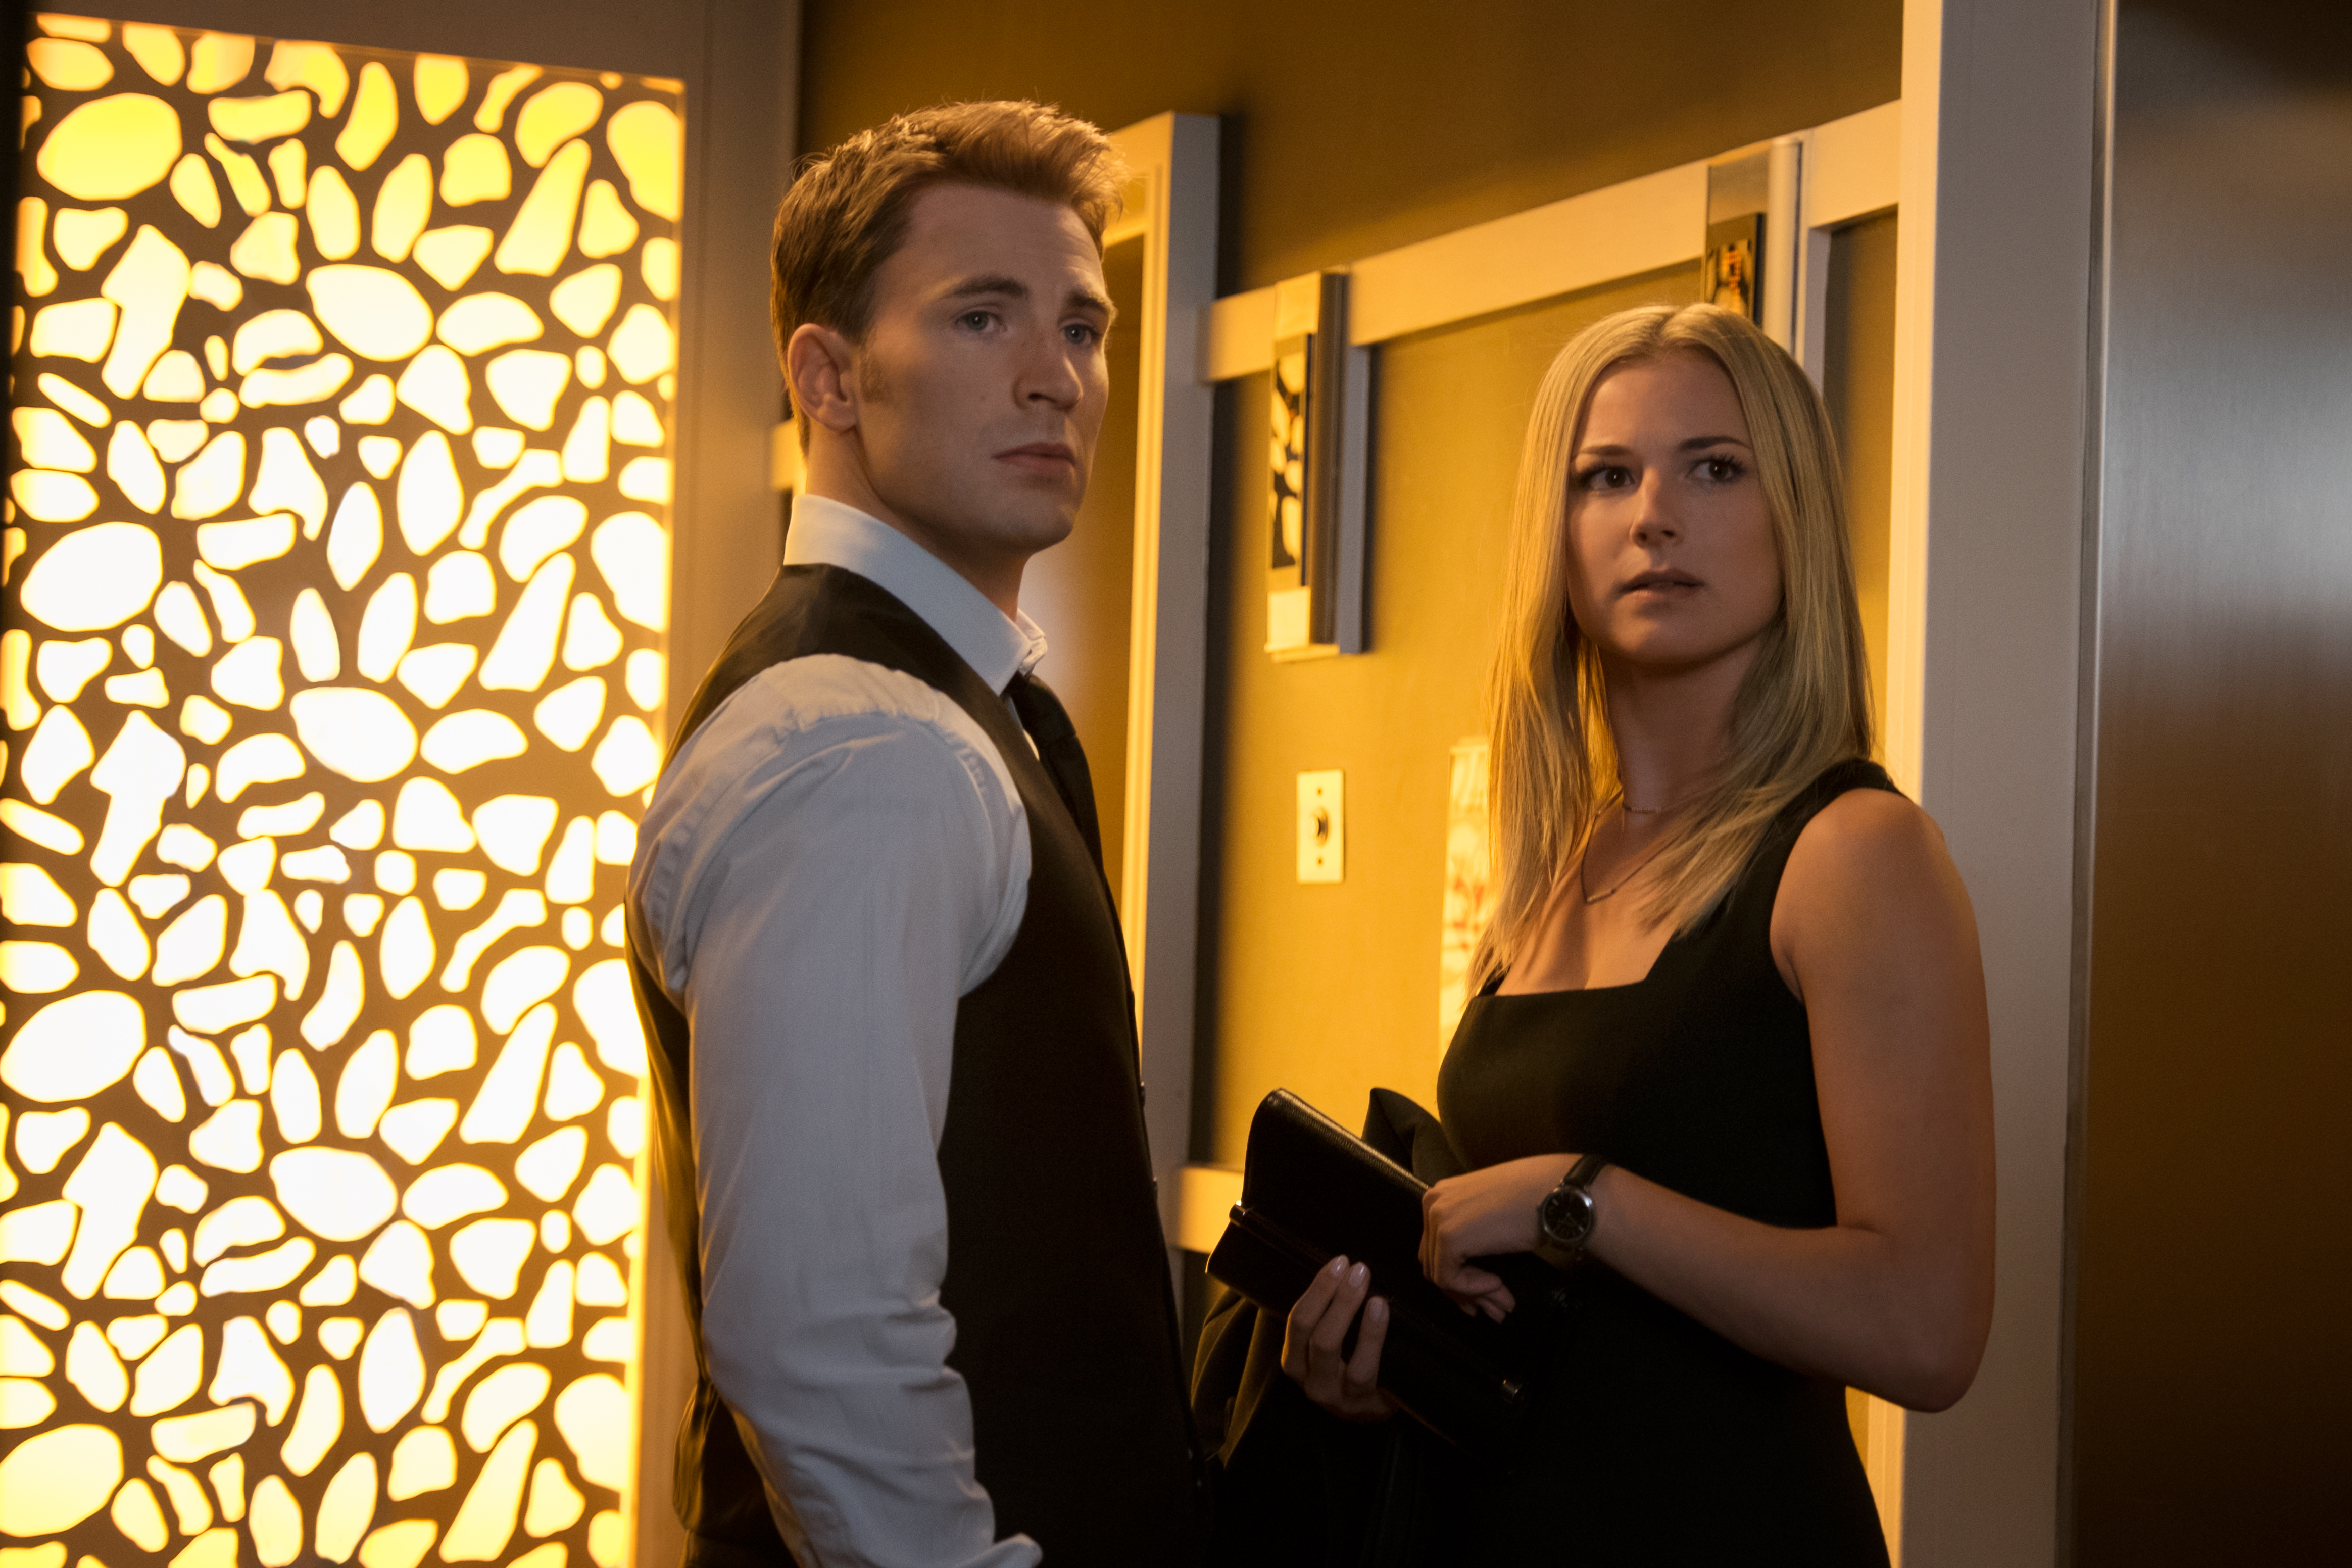 Captain America/Steve Rogers (Chris Evans) and Agent 13/Sharon Carter (Emily VanCamp) in Captain America: Civil War